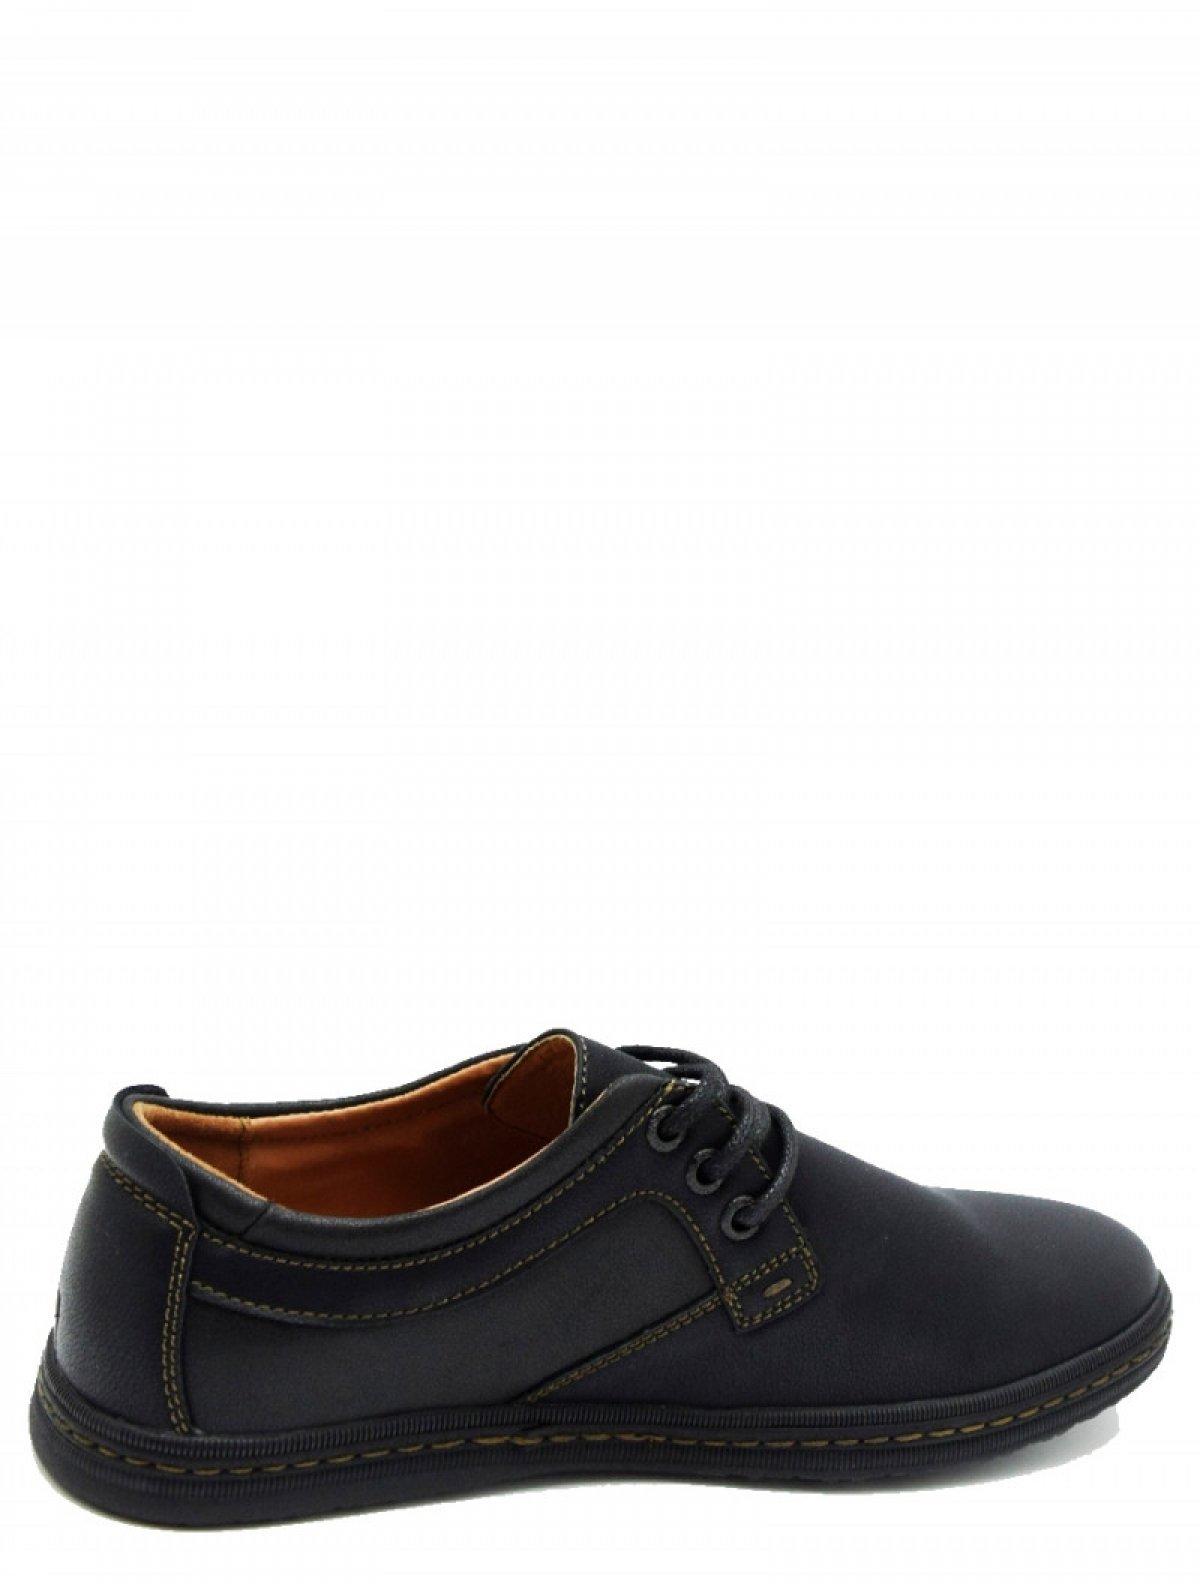 Carido 797-830-4 мужские туфли